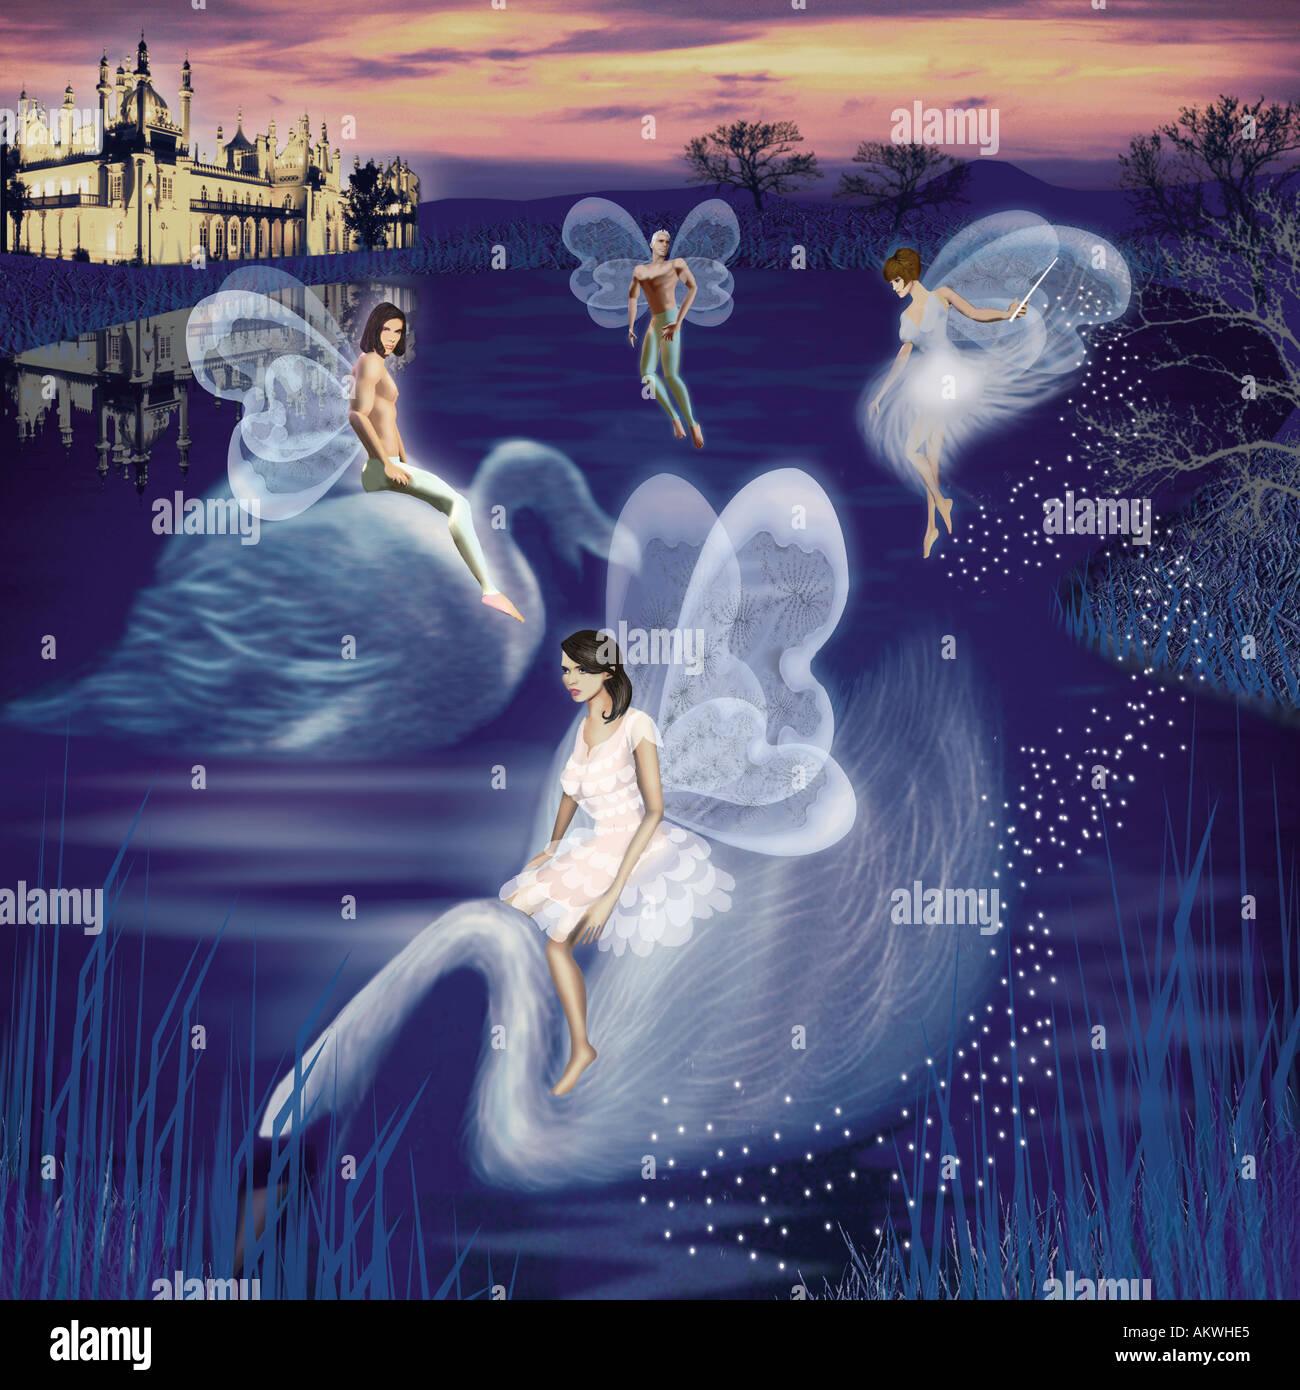 photo illustration fairies sitting on swans gliding through air water royal pavilion brighton in background  illuminated - Stock Image